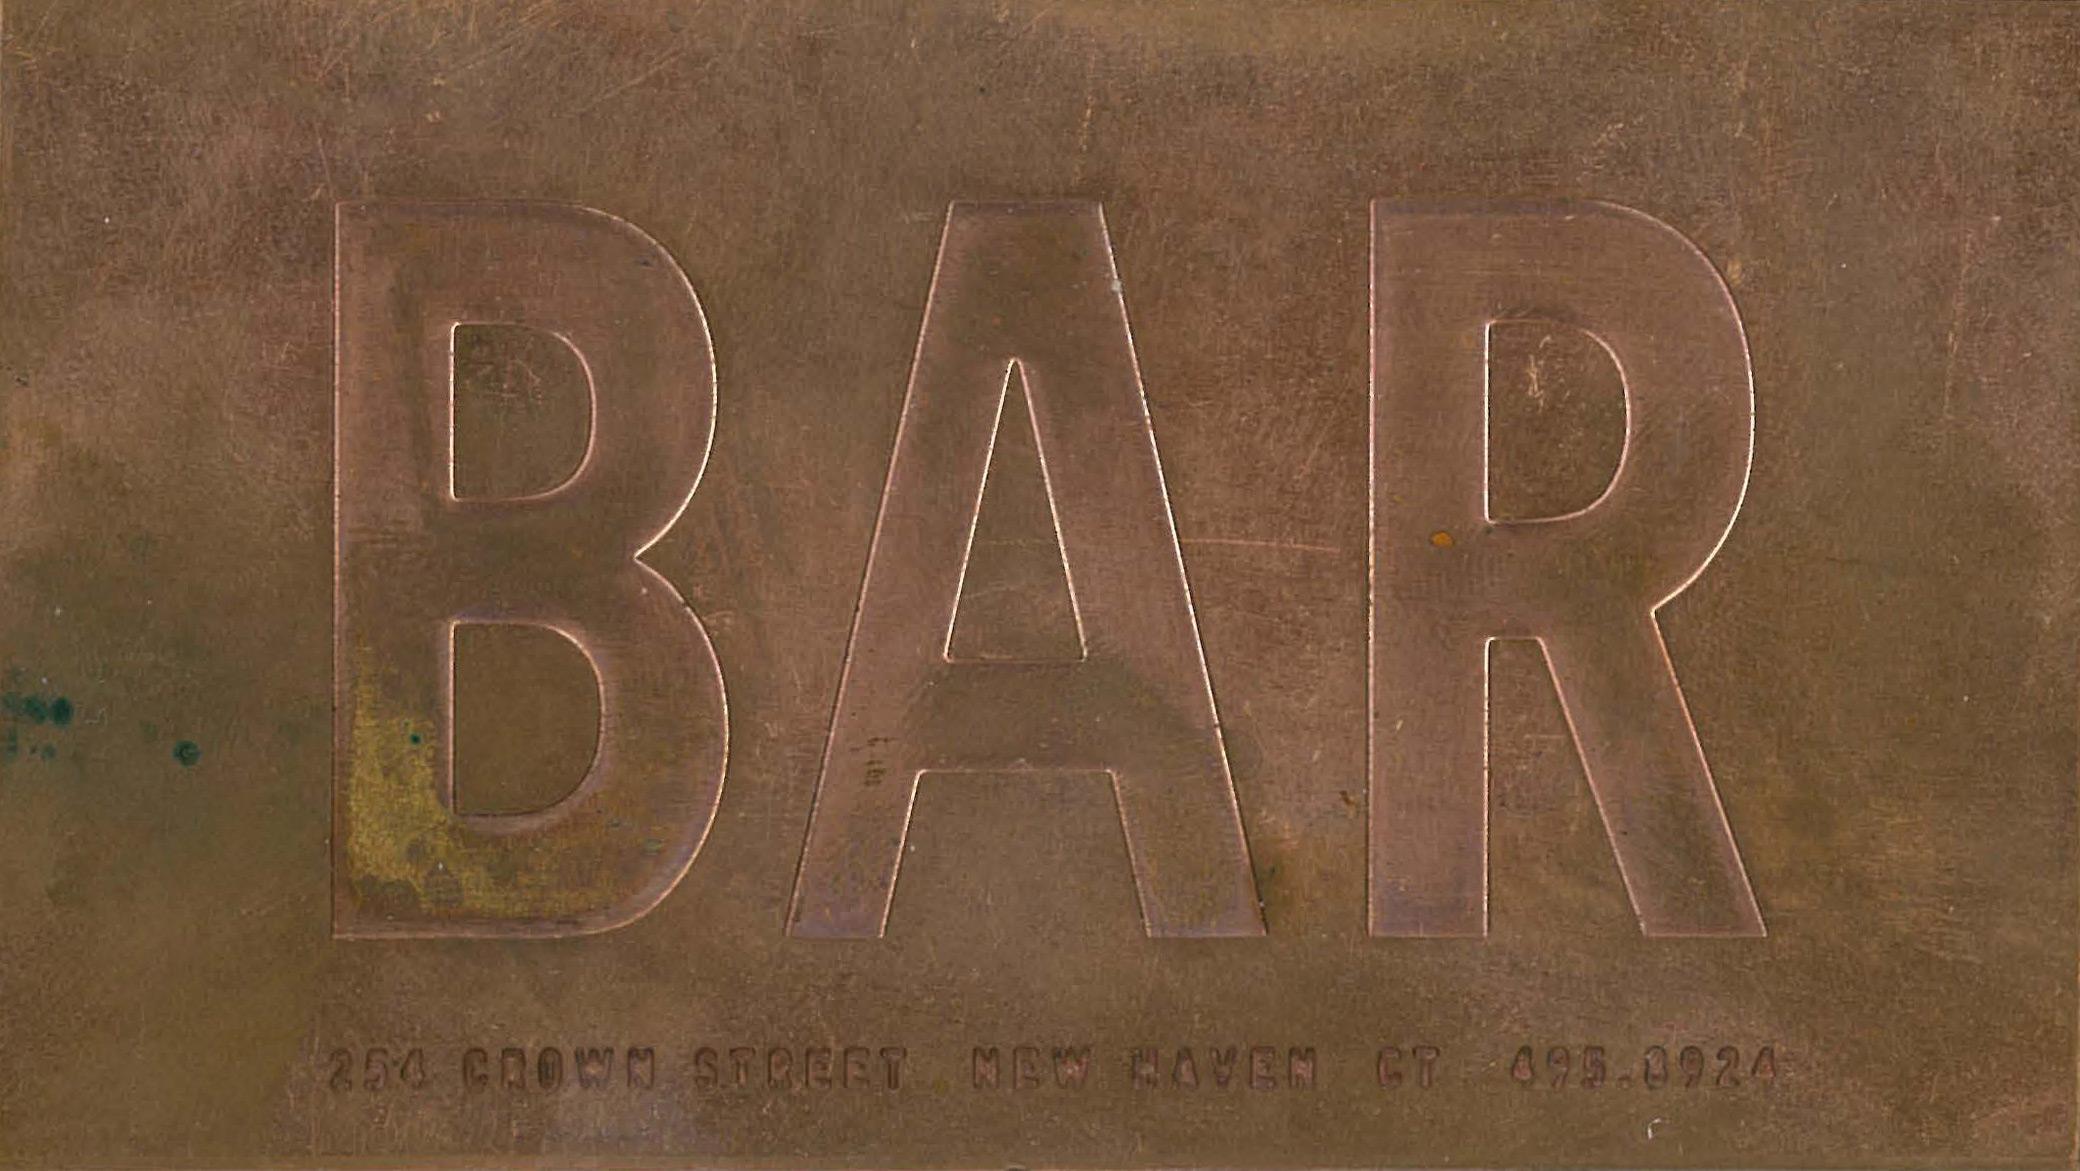 BAR New Haven